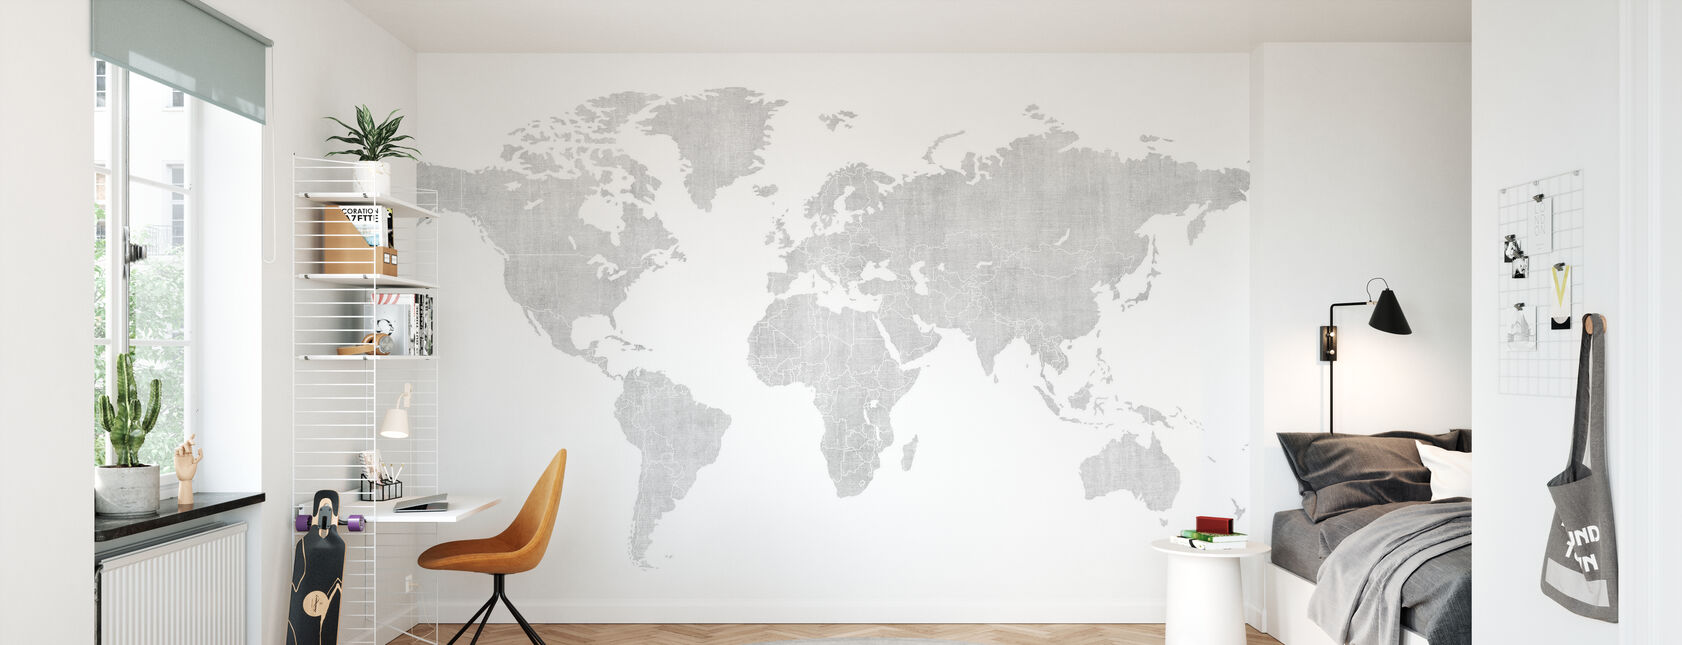 Voguish World Kartta - Kirkas - Tapetti - Lastenhuone